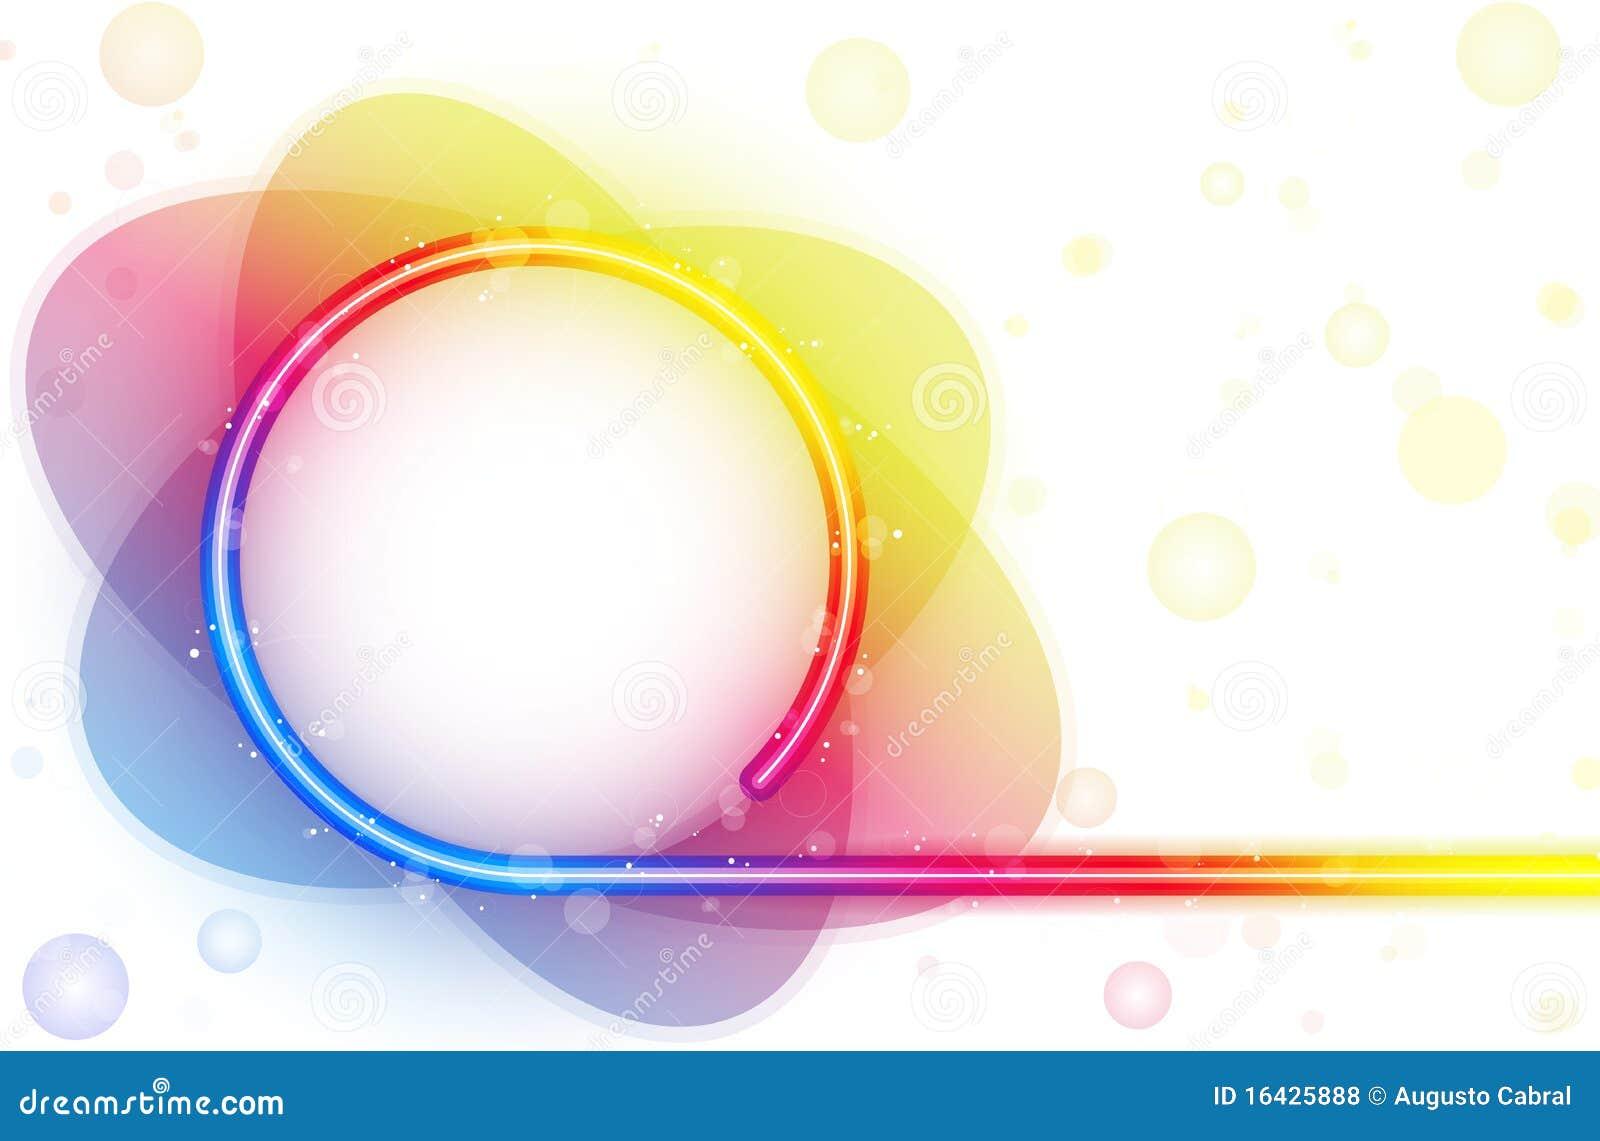 Rainbow Circle Border With Sparkles Royalty Free Stock